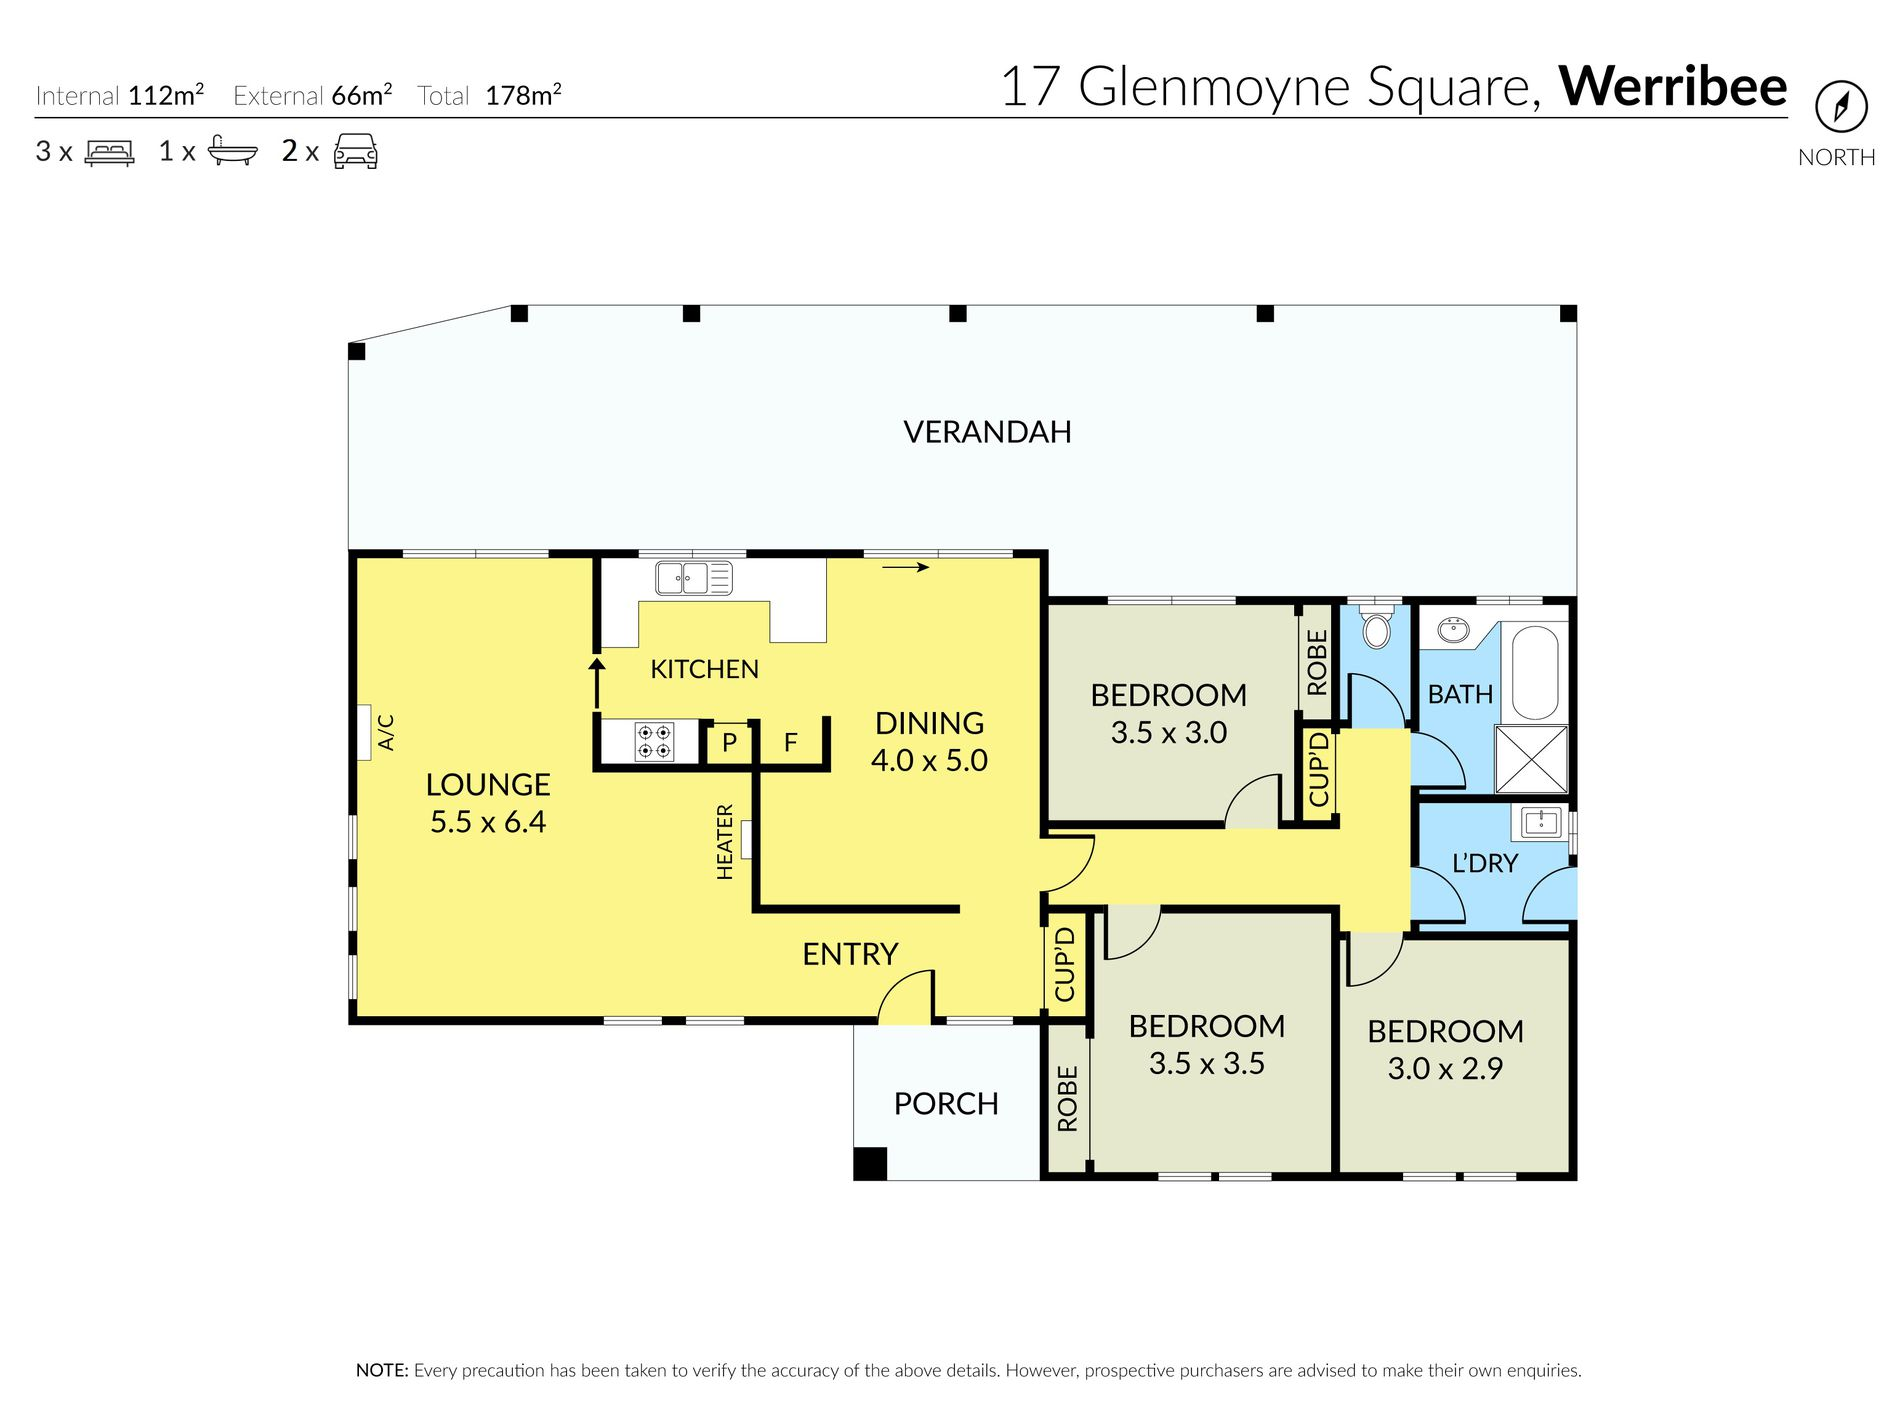 17 Glenmoyne Square, Werribee